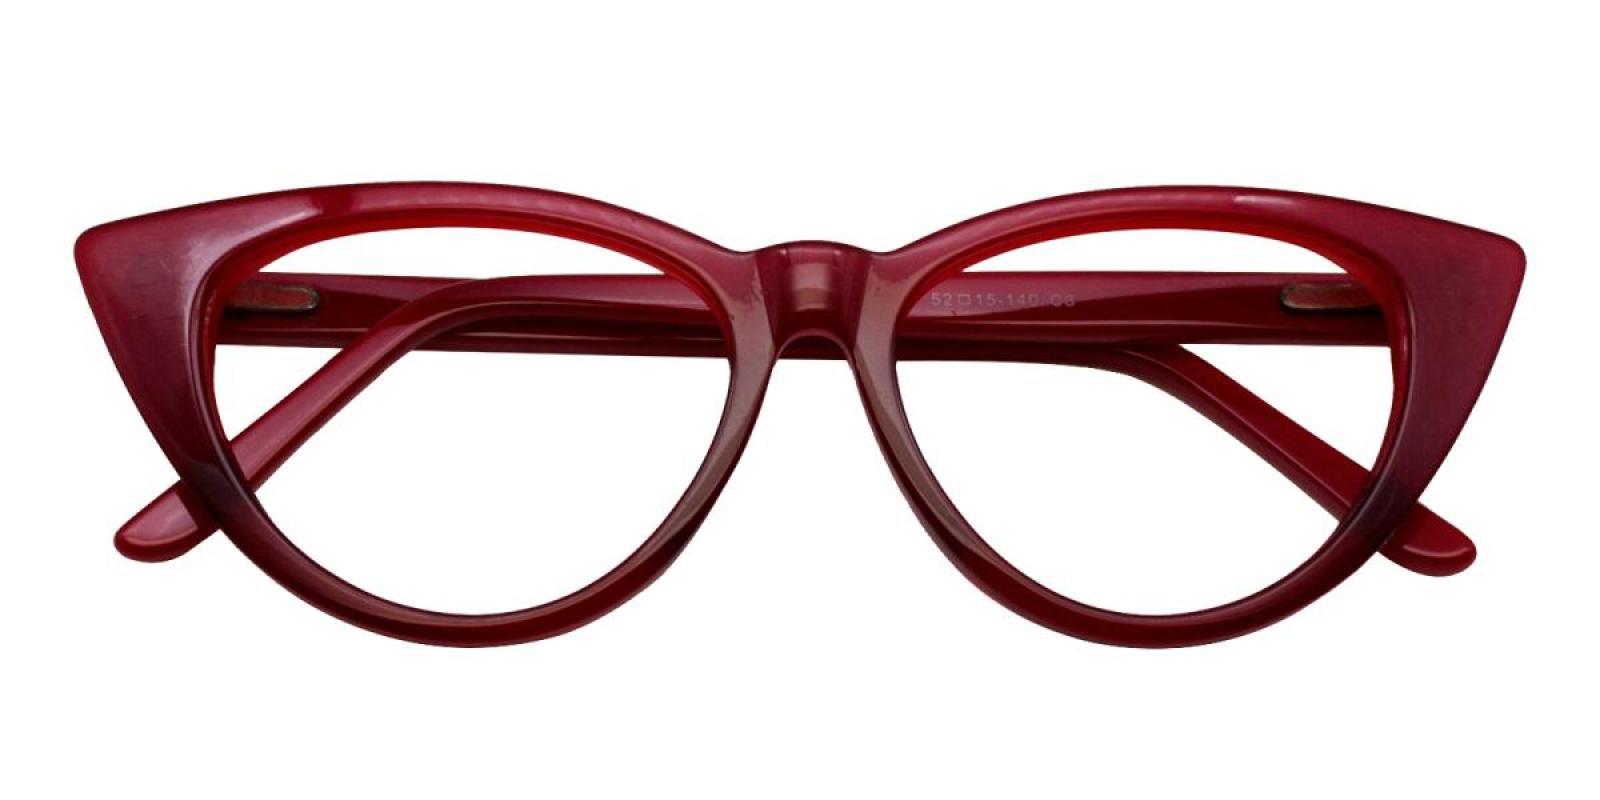 Charm-Red-Cat-Acetate-Eyeglasses-detail